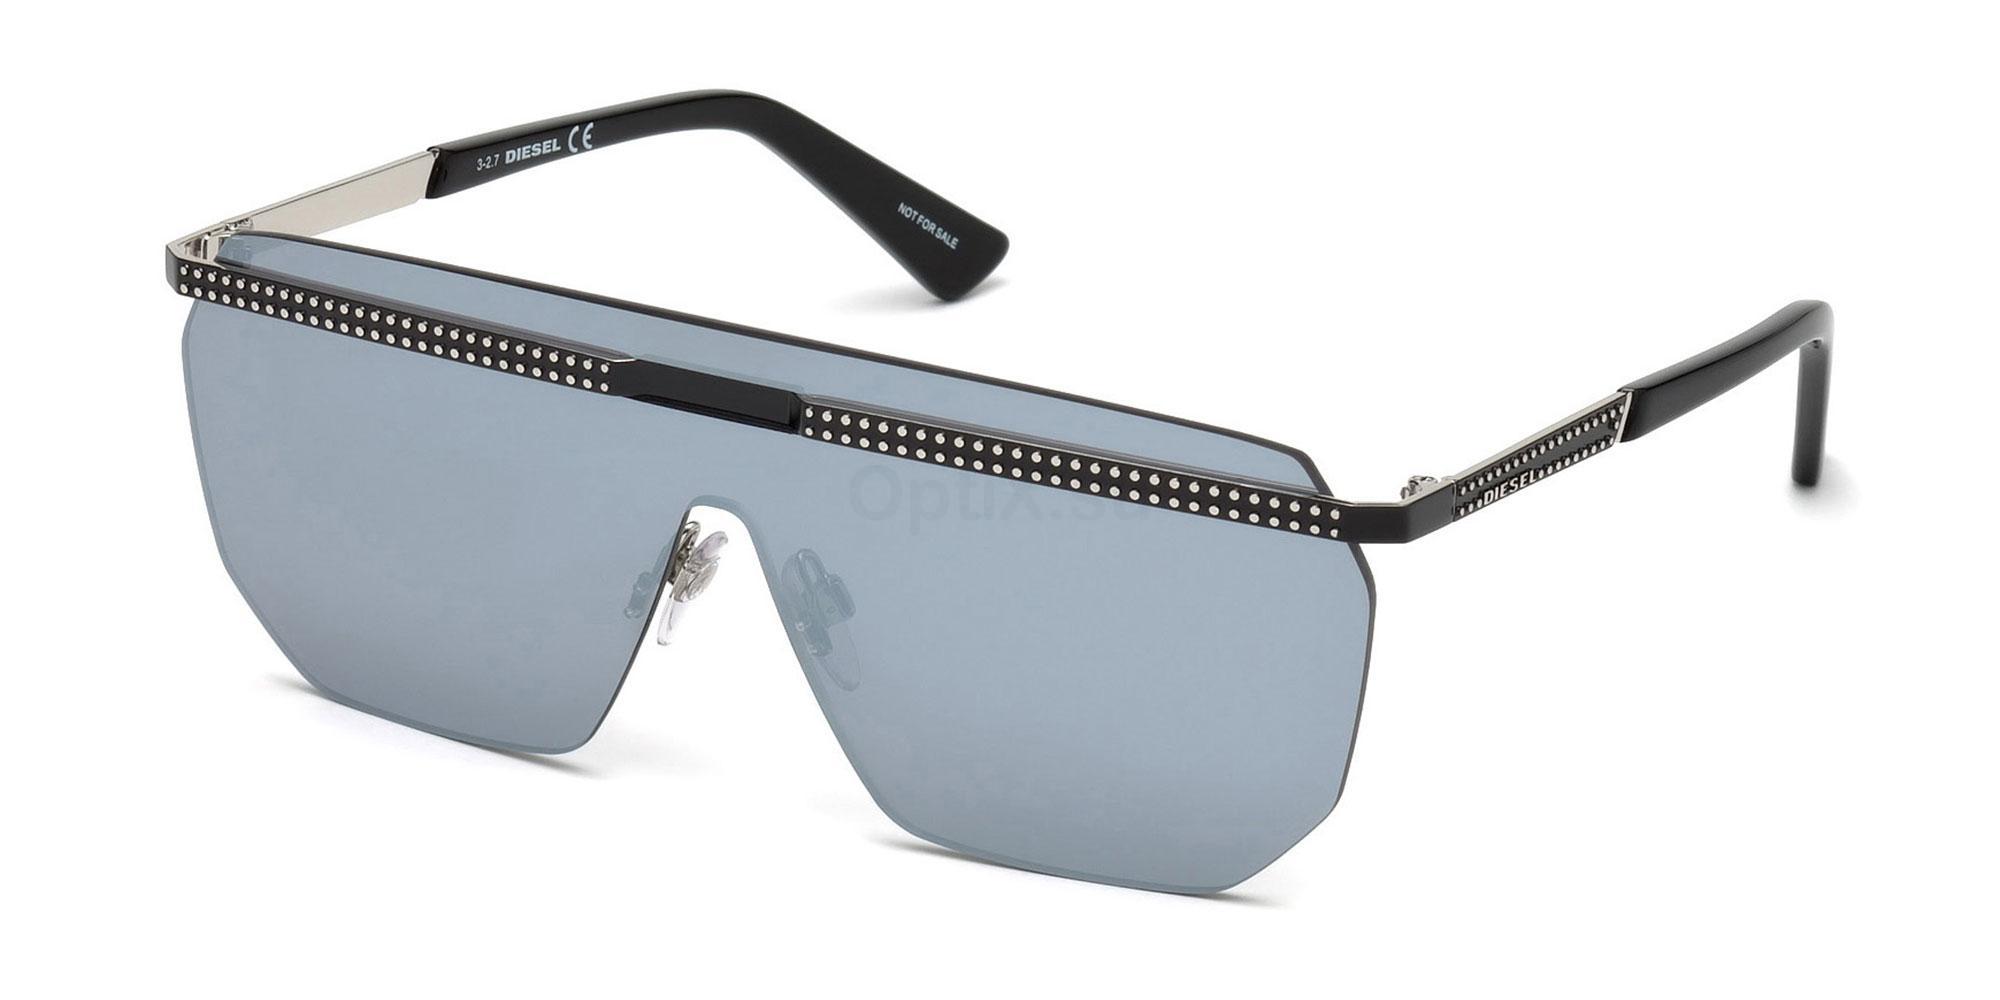 20C DL0259 Sunglasses, Diesel